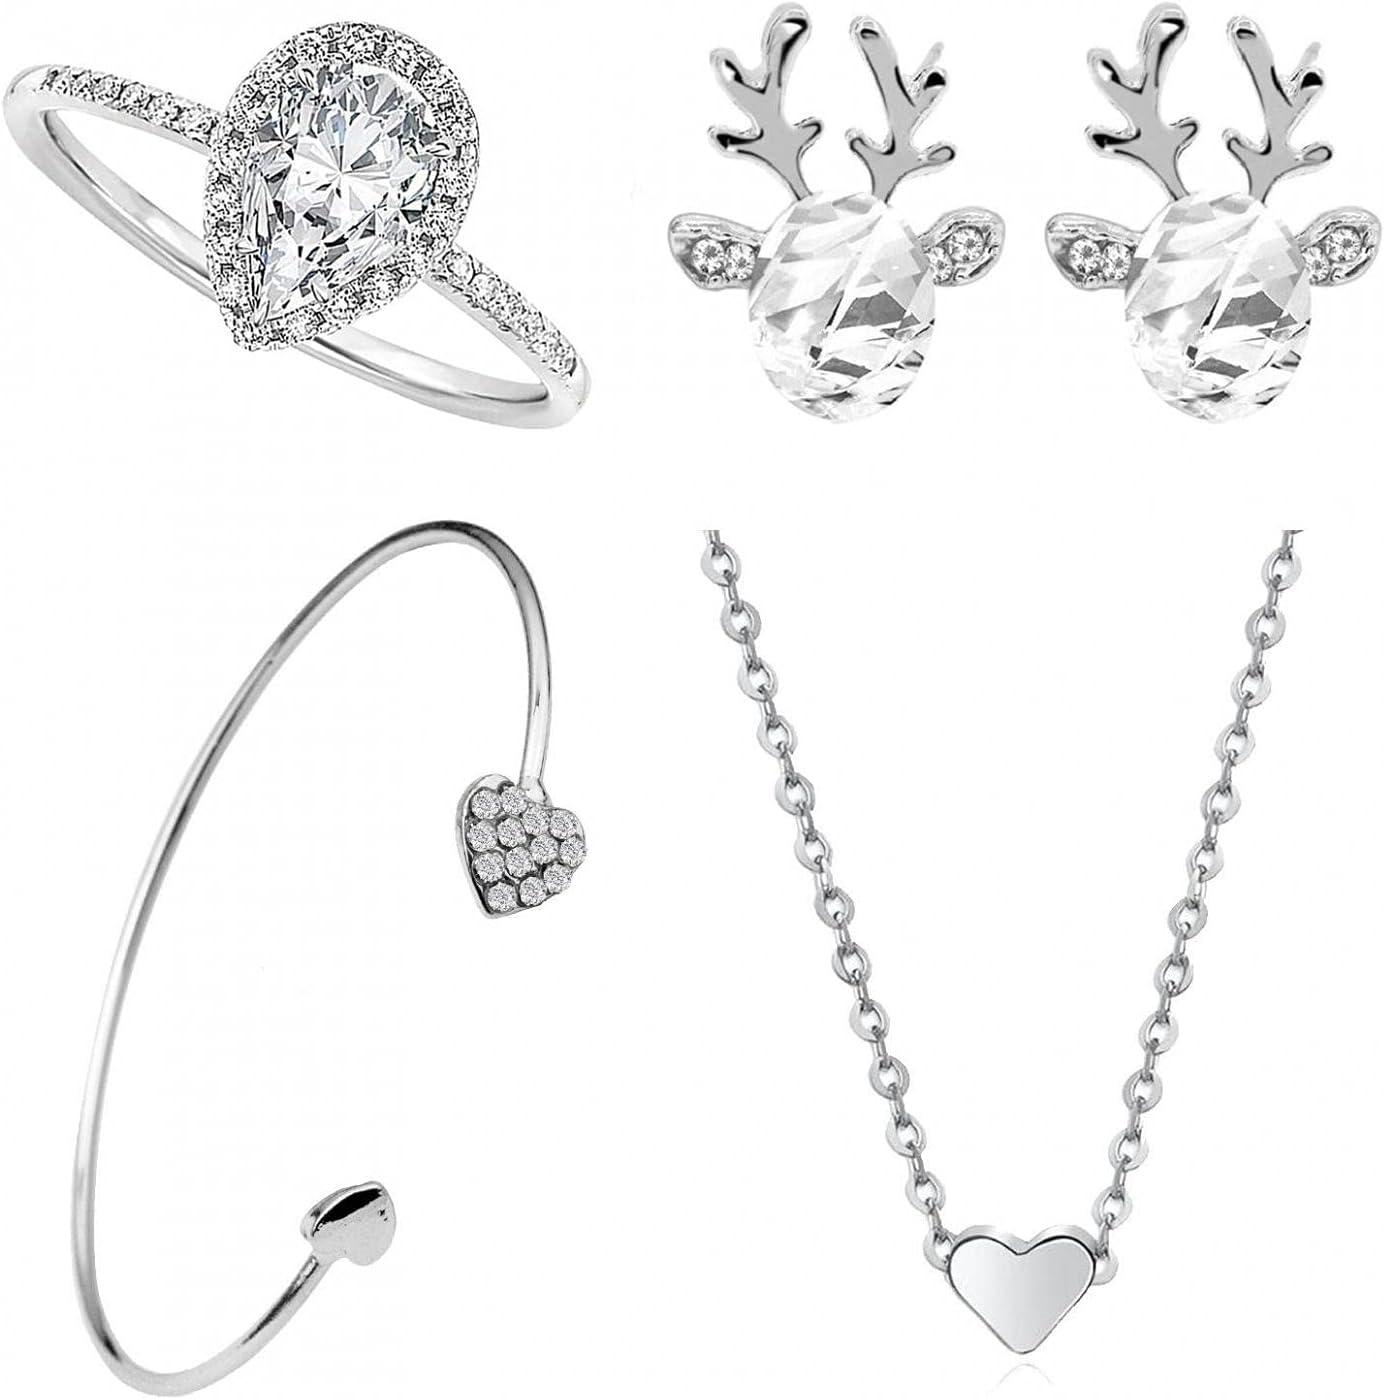 Necklace Earrings Bracelet Max 70% Elegant OFF Ring Jewelry for Women Arkutor Sets 4